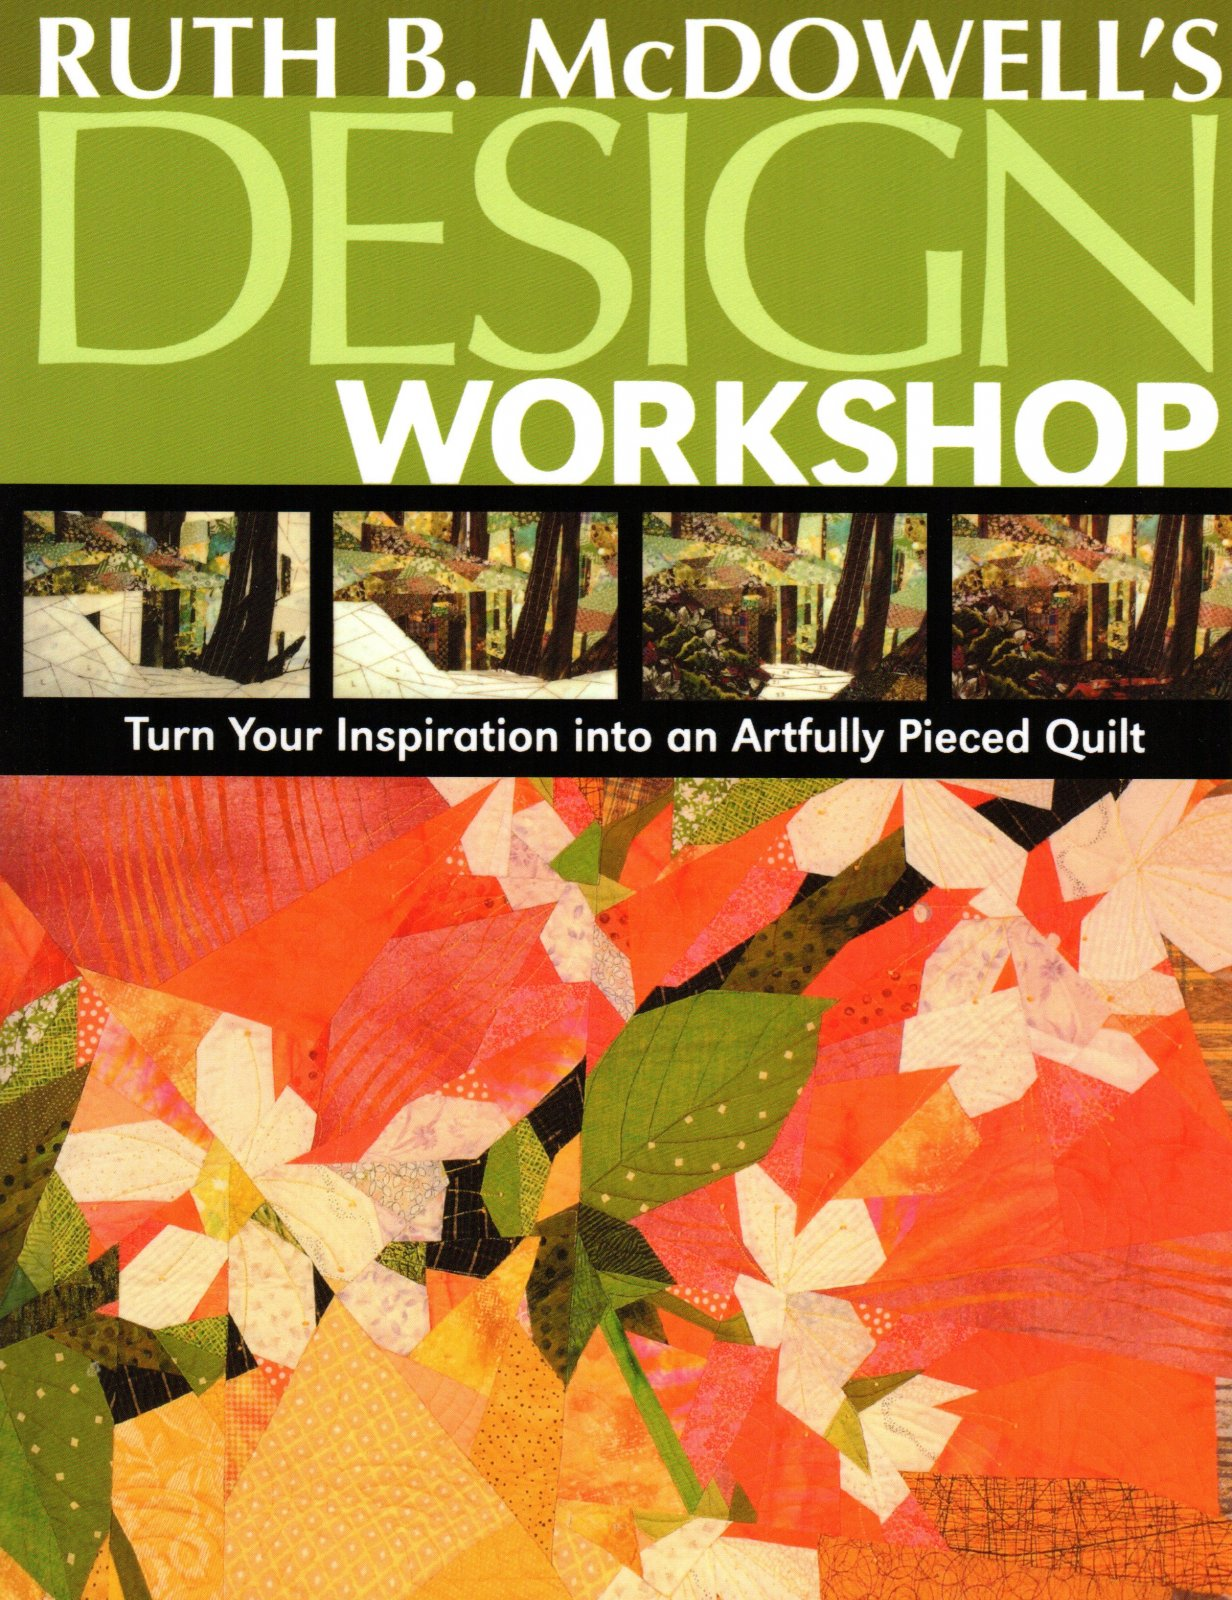 Ruth B. McDowell's Design Workhsop